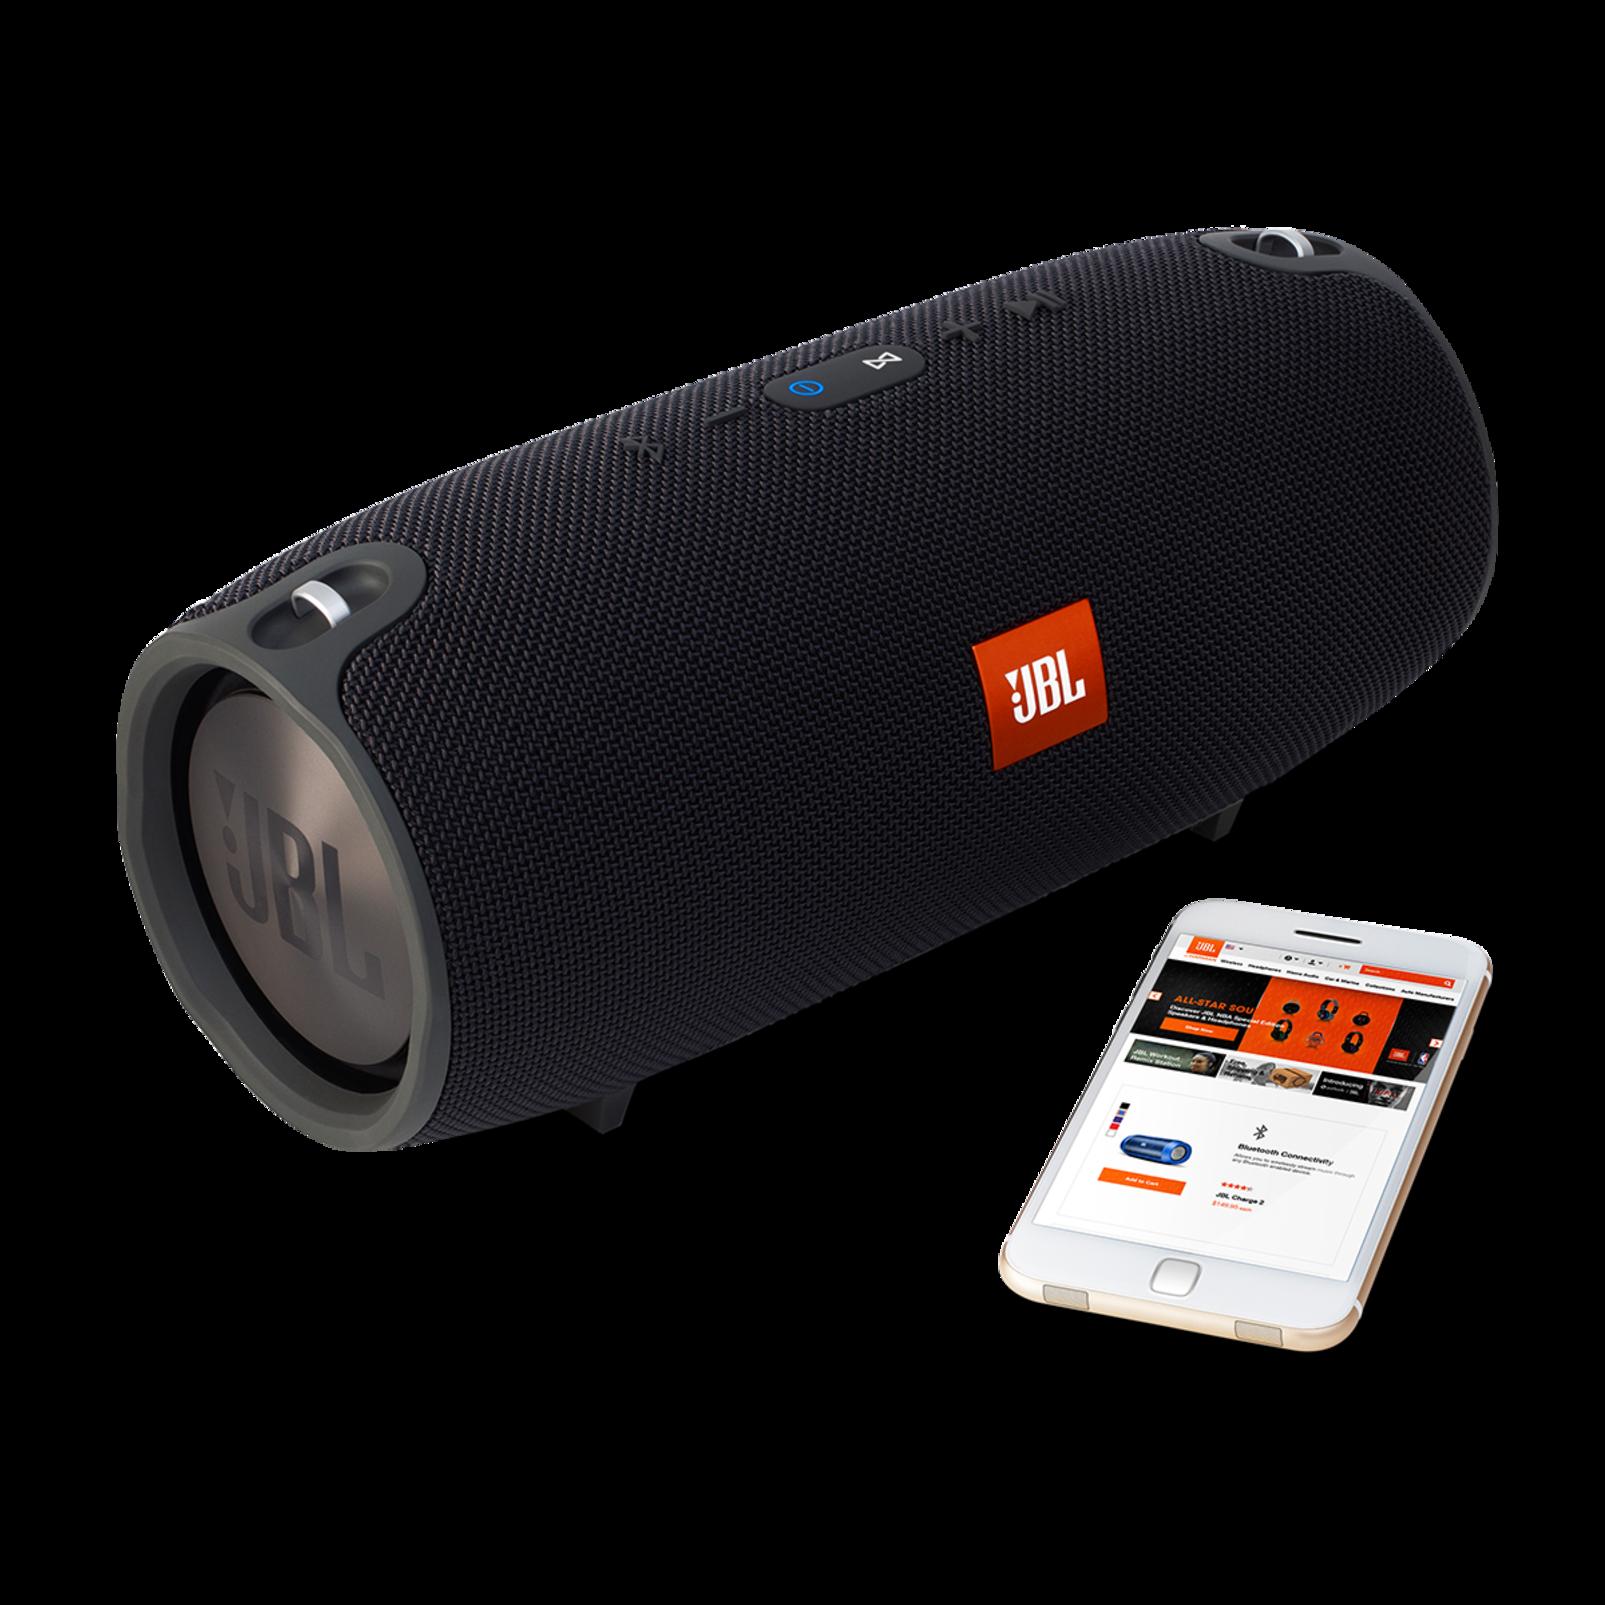 JBL Xtreme - Black - Splashproof portable speaker with ultra-powerful performance - Detailshot 4